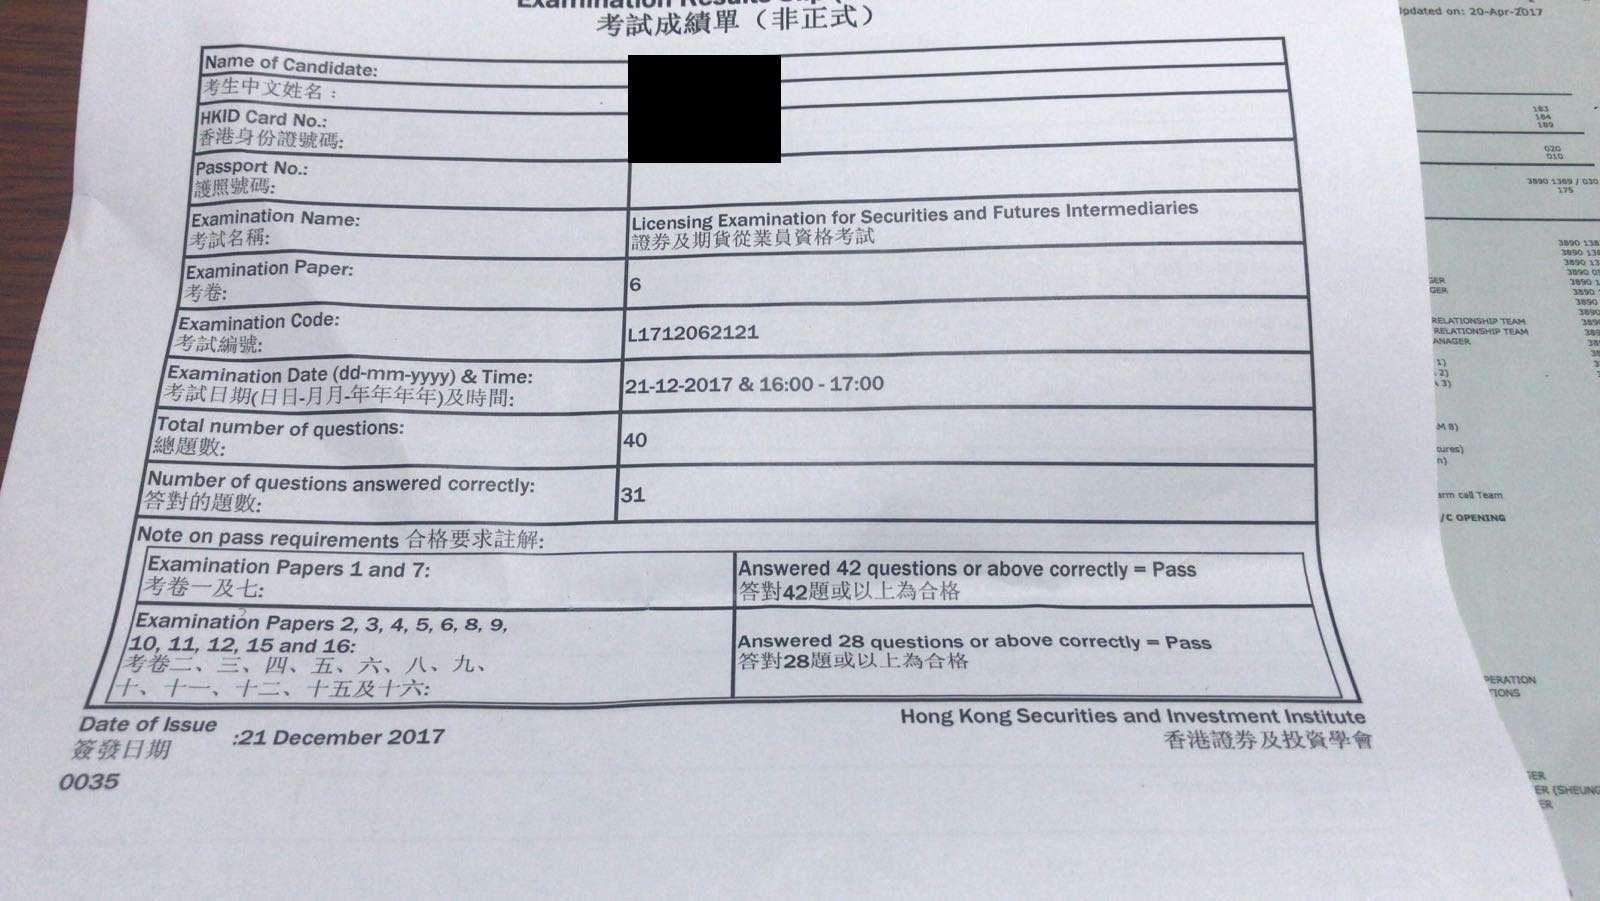 YBH 21/12/2017 LE Paper 6 證券期貨從業員資格考試卷六 Pass